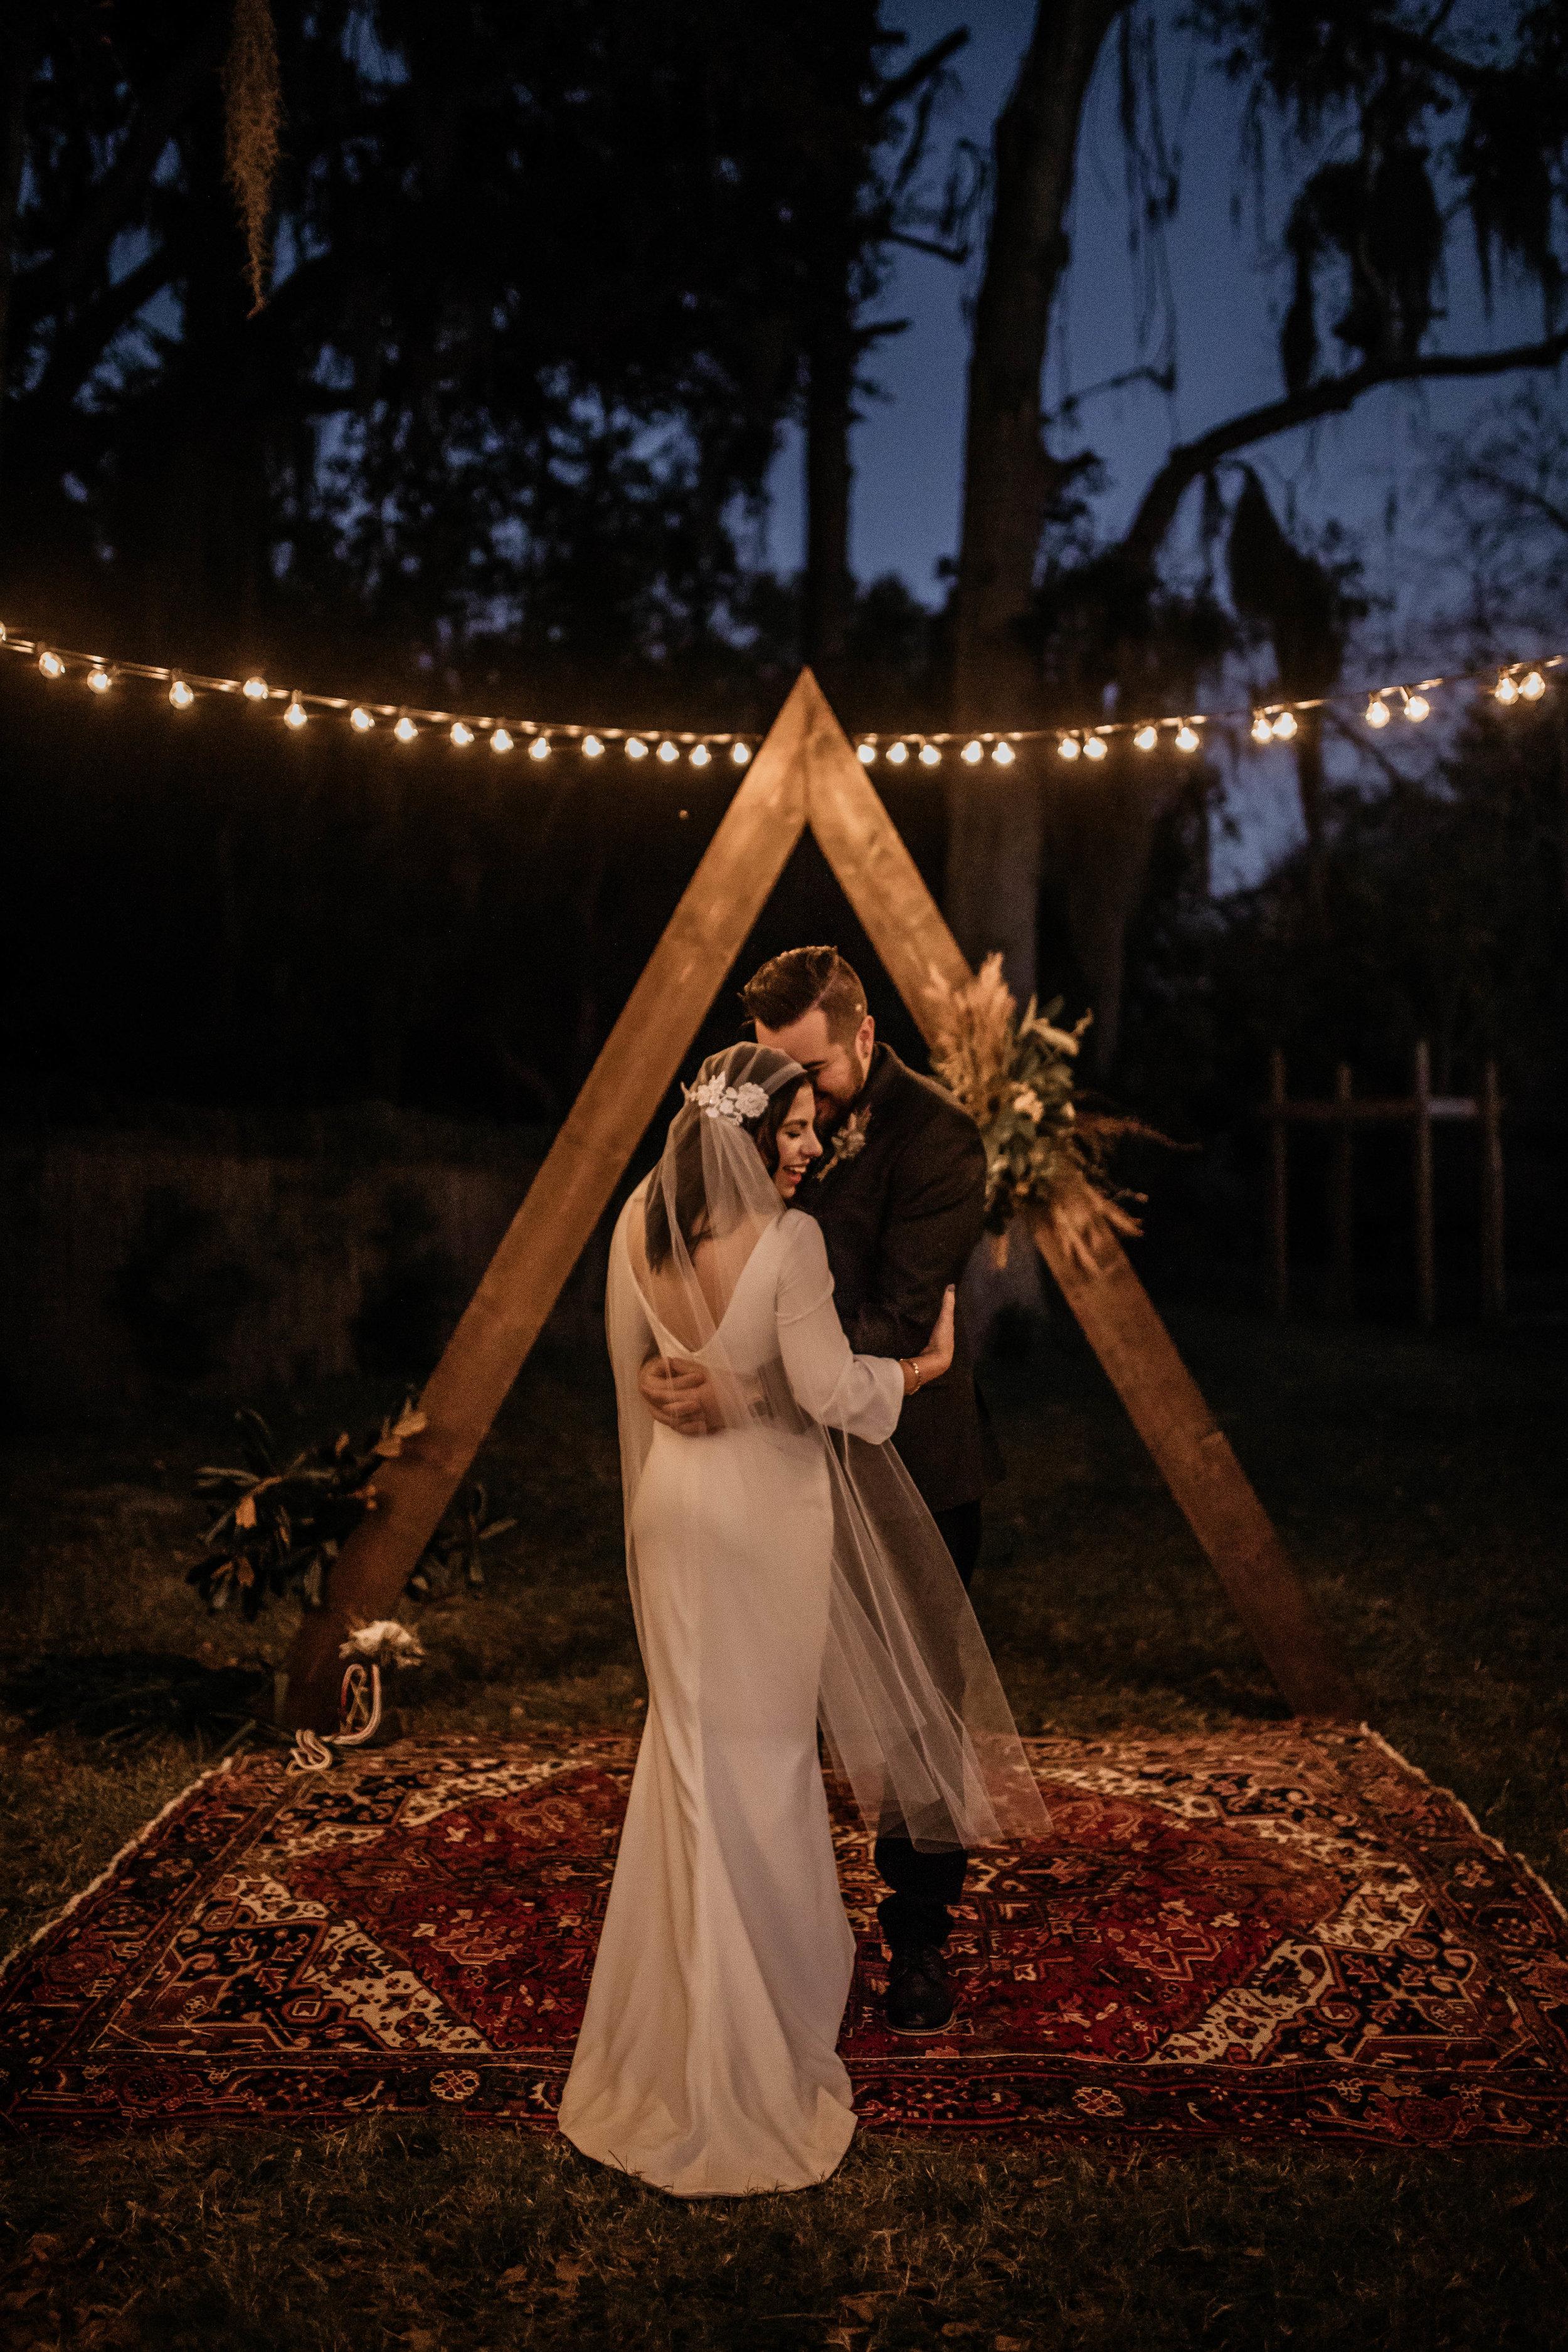 Night Bride & Groom Photos | American Traditional Tattoo Themed Eco Friendly Dark Florida Wedding